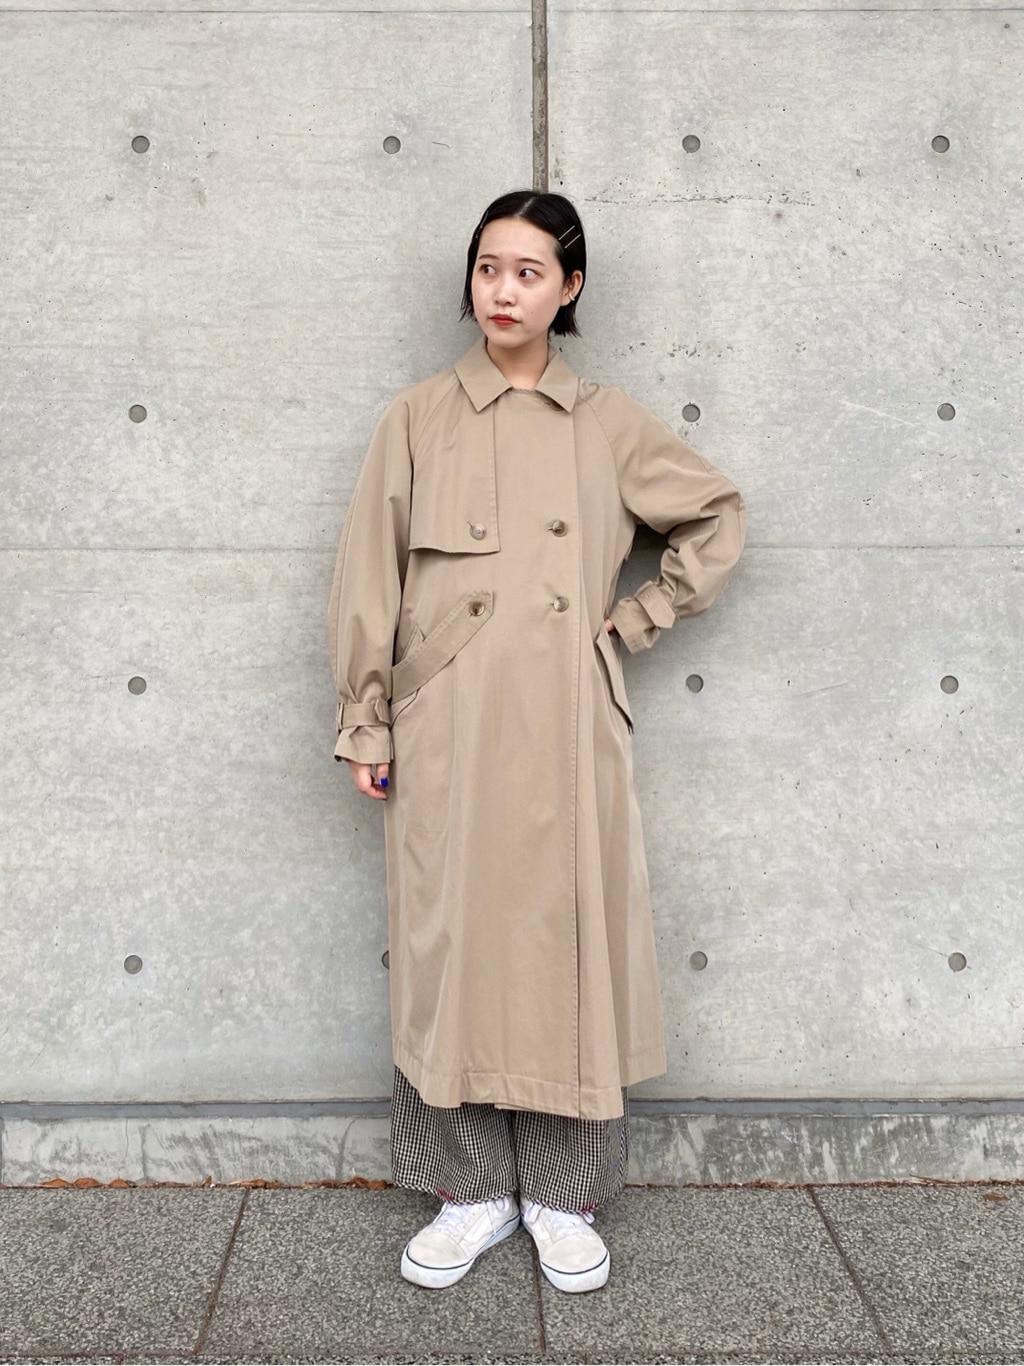 l'atelier du savon 新宿ミロード 身長:159cm 2021.04.15